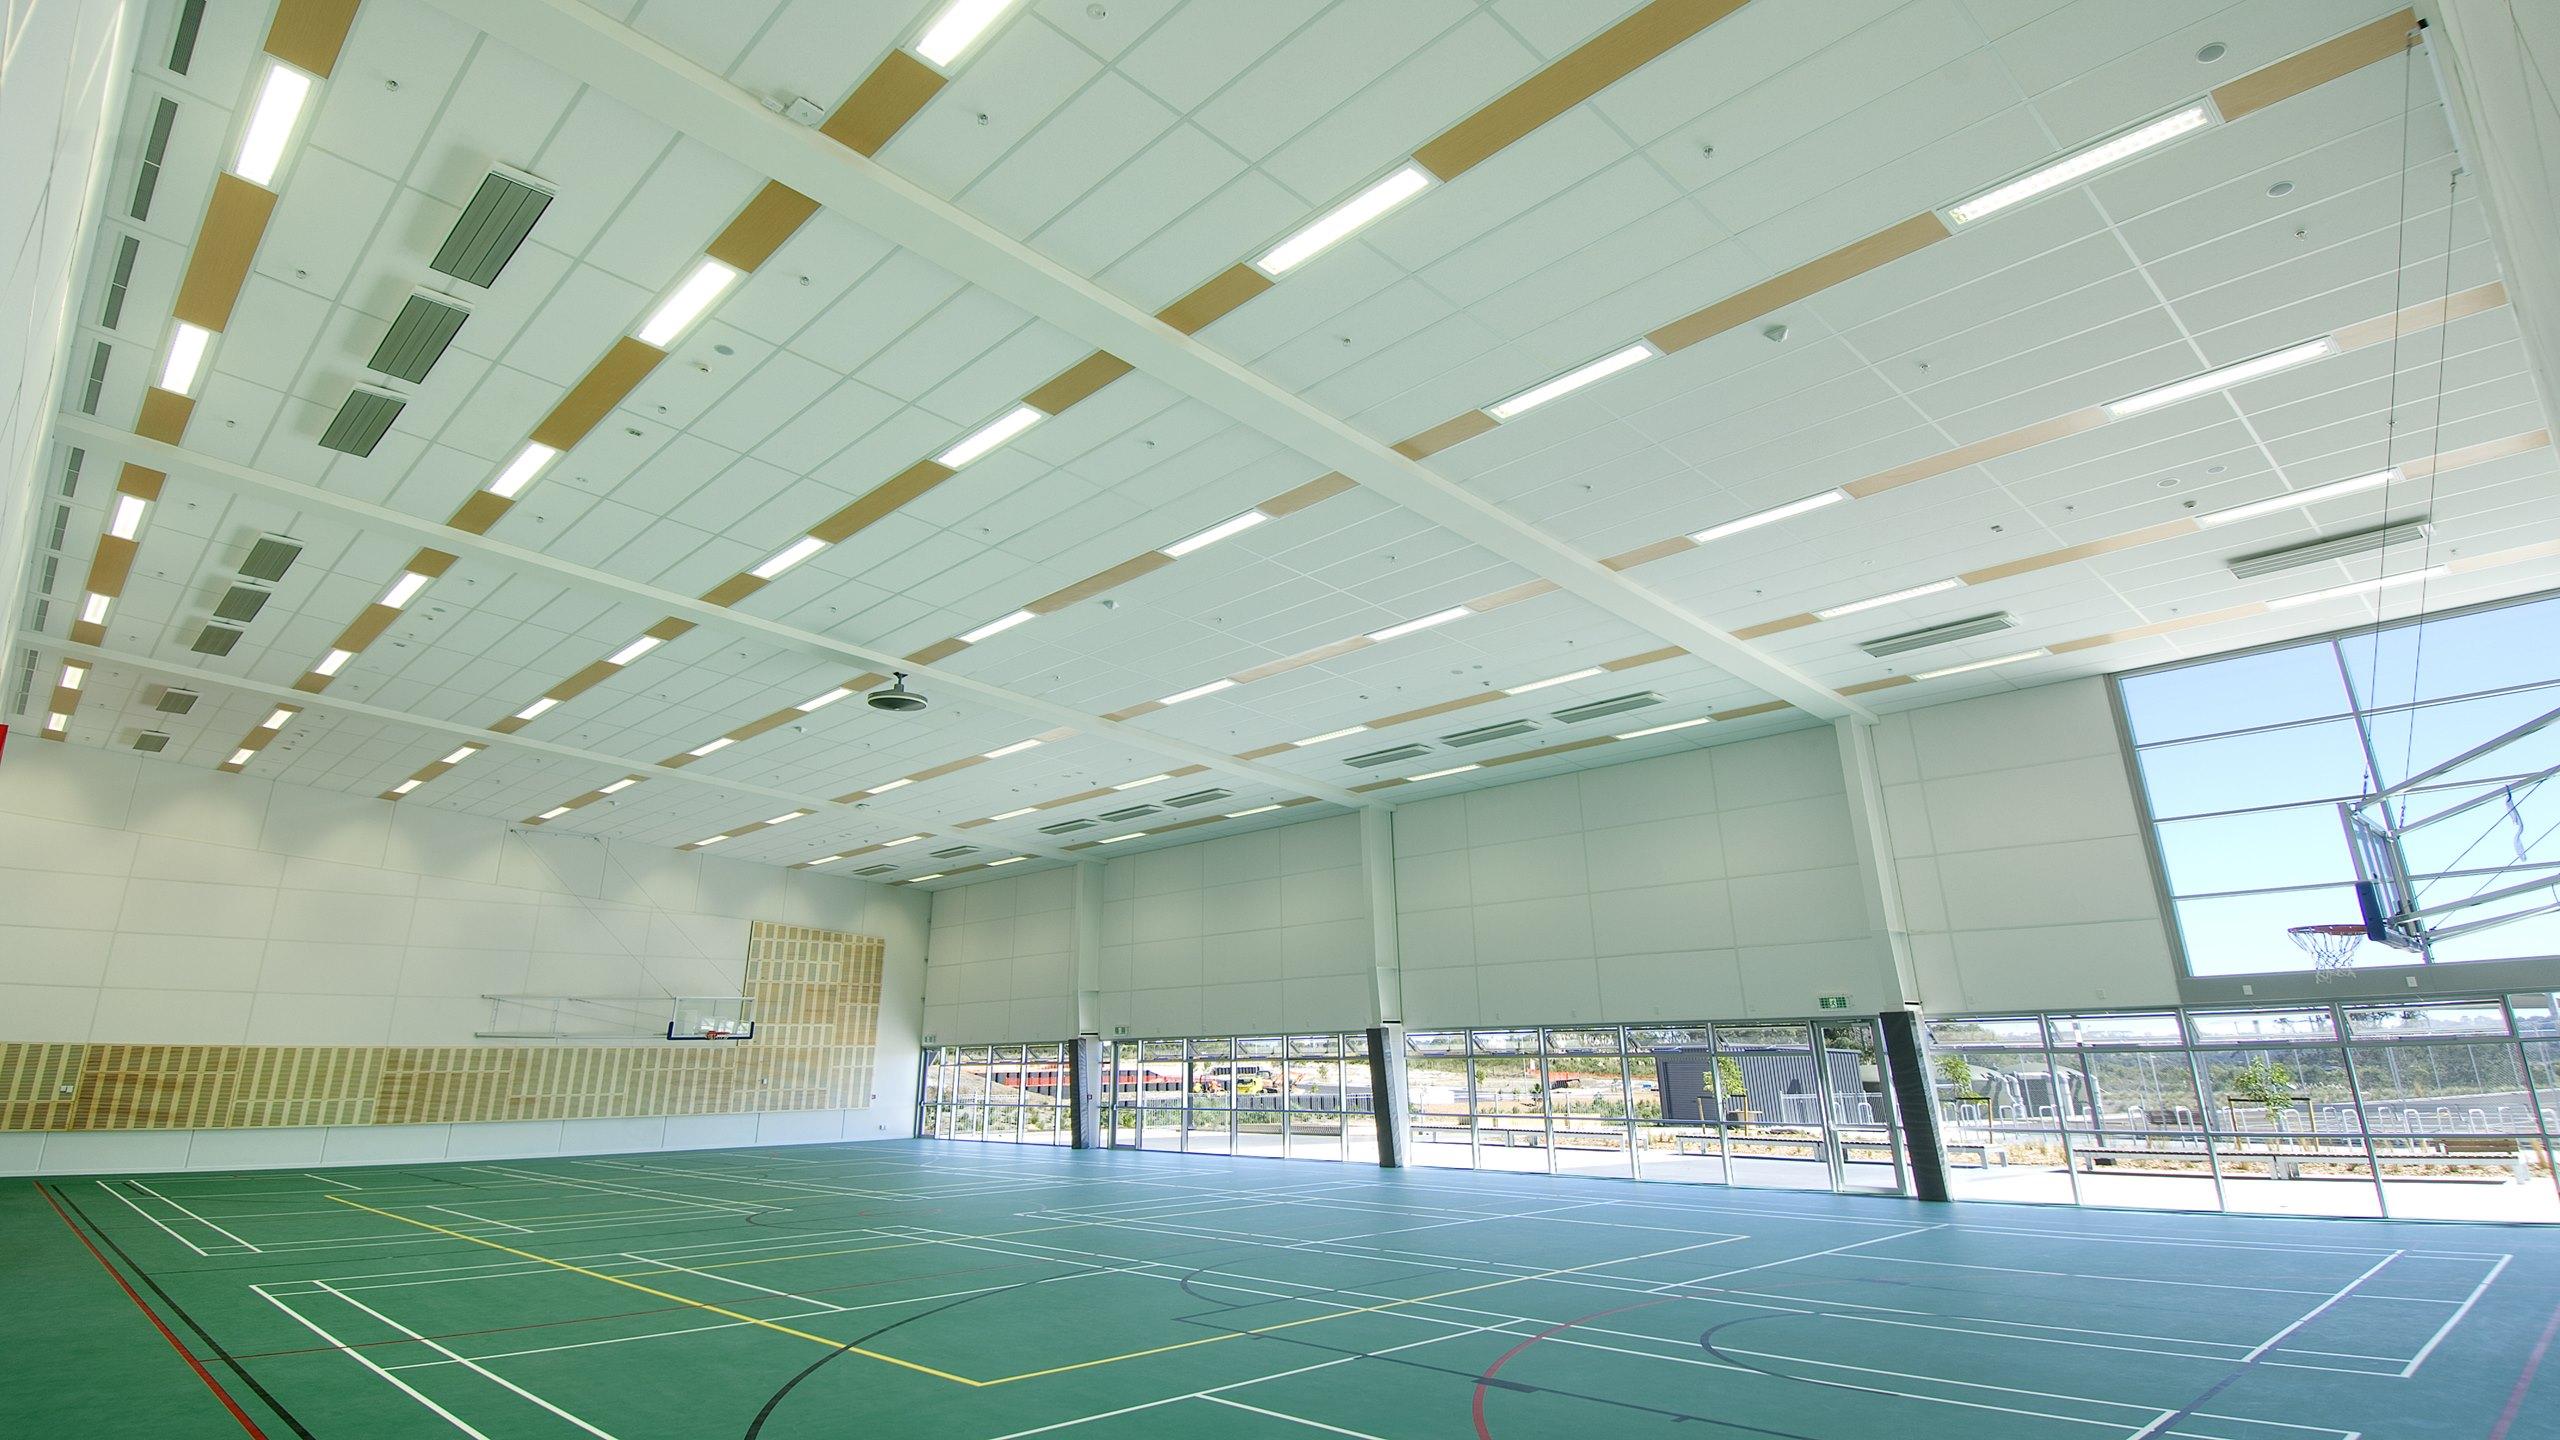 Hobsonville Secondary School Gym - Triton Sports